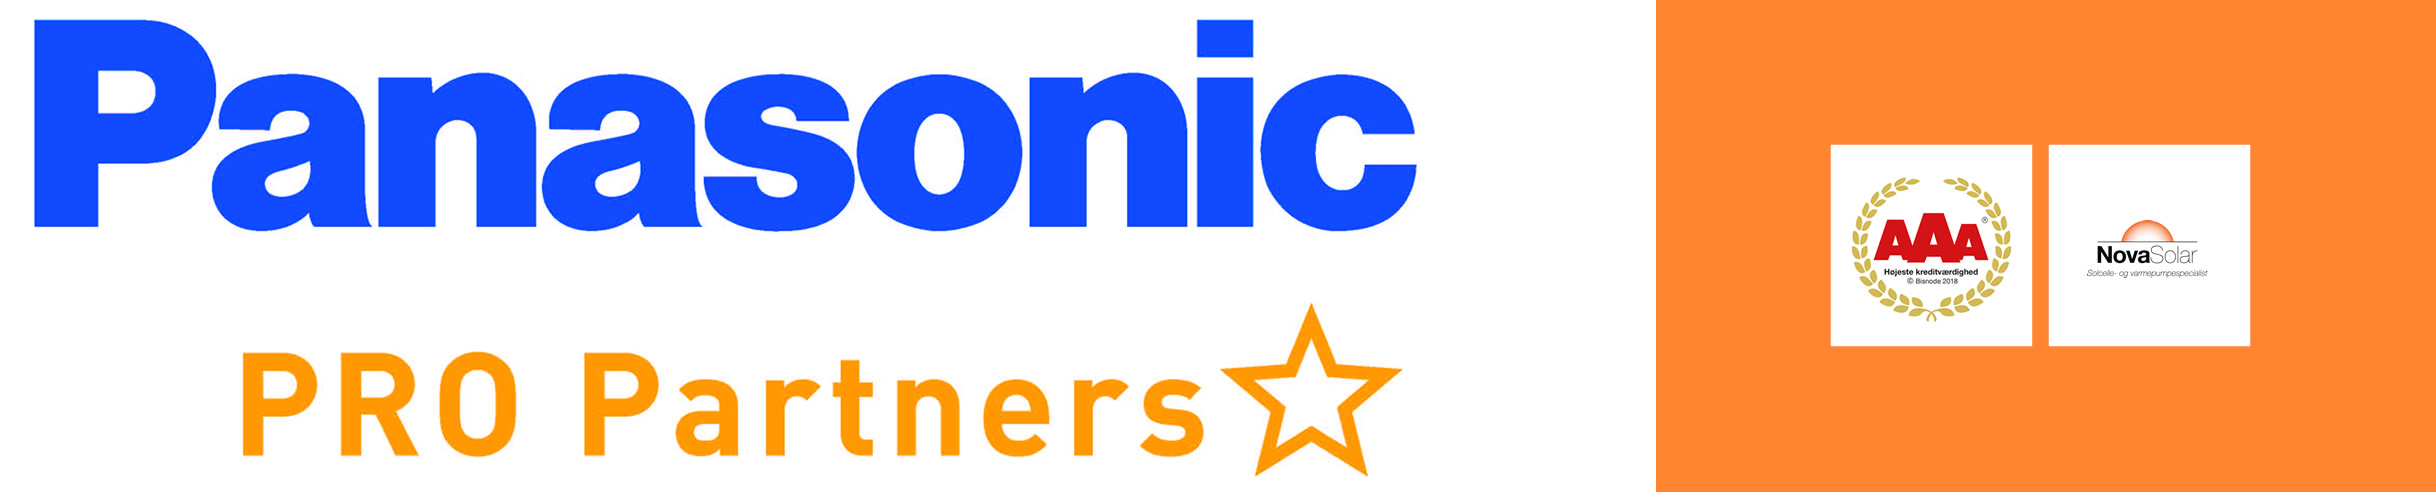 NovaSolar er Panasonic Pro Partner